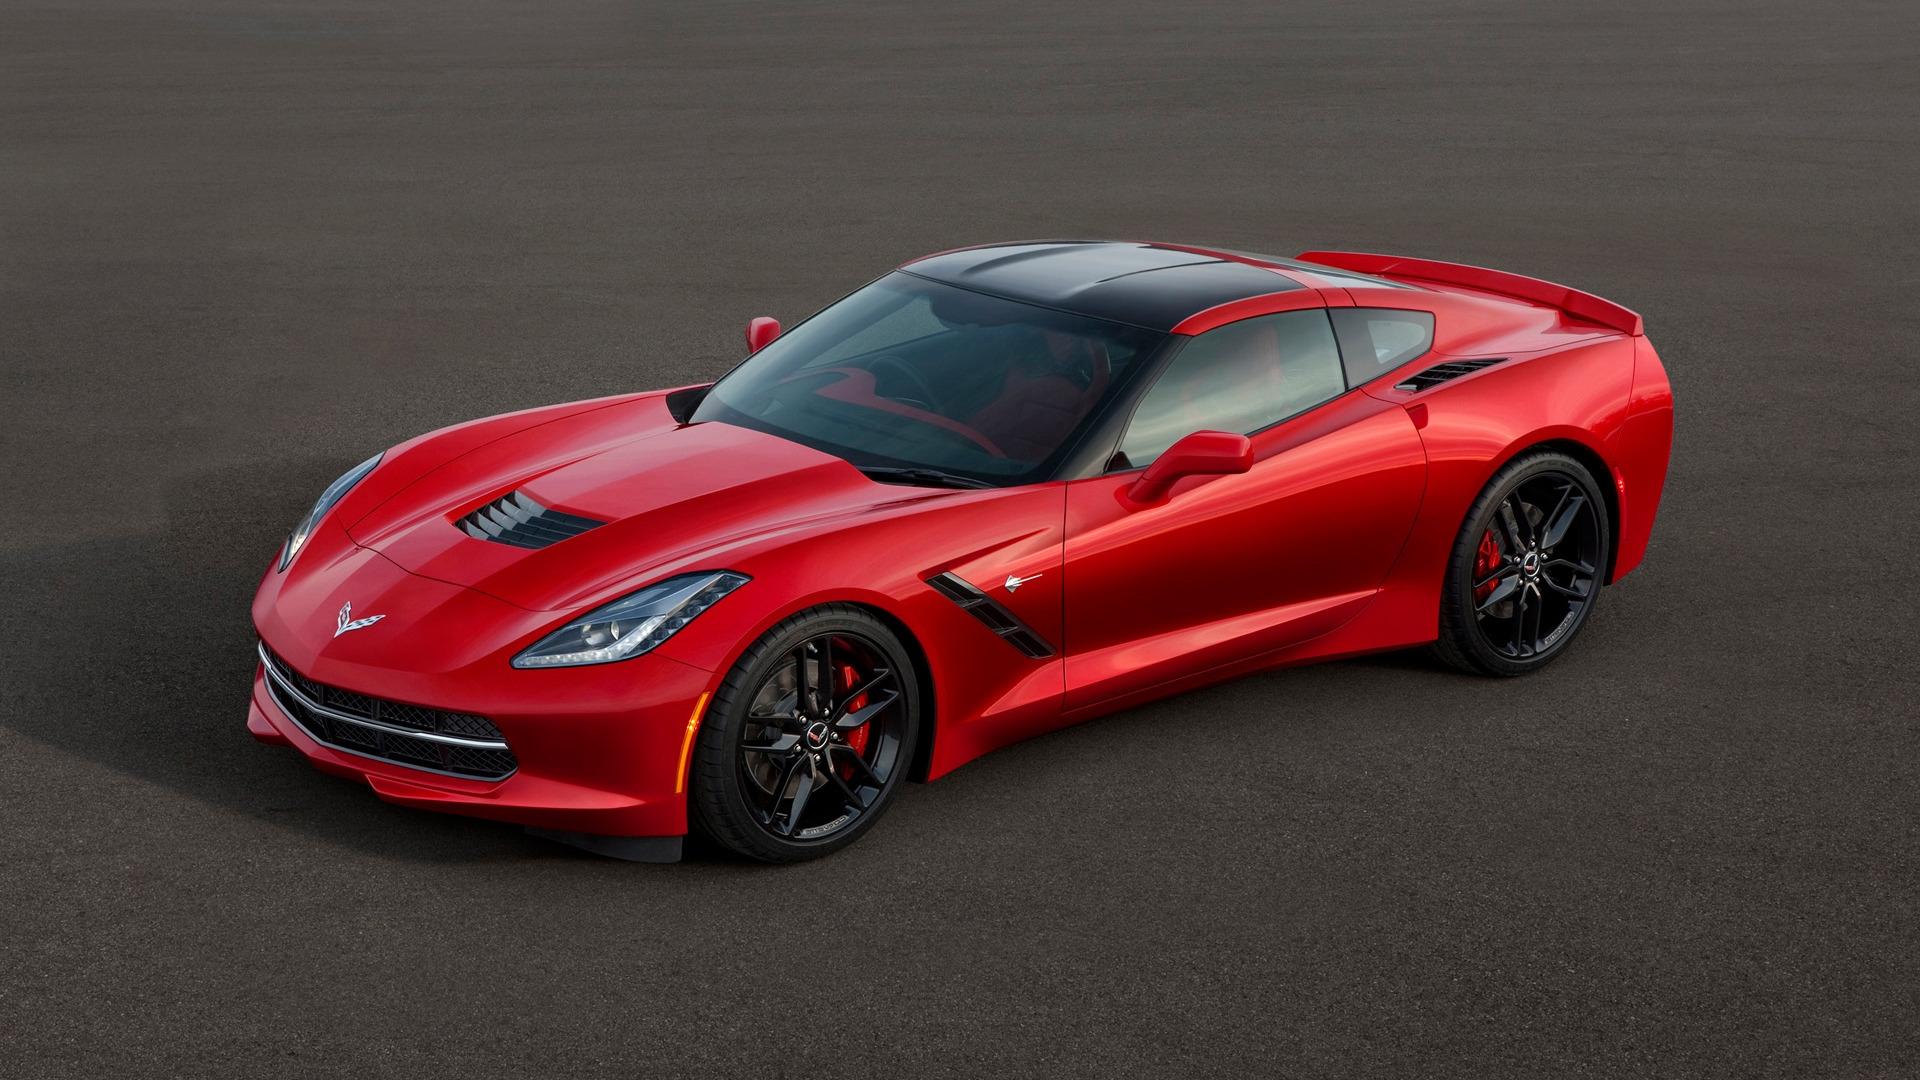 chevrolet-corvette-c-stingray-Corvette-Stingray-White-within-che-wallpaper-wp3601054